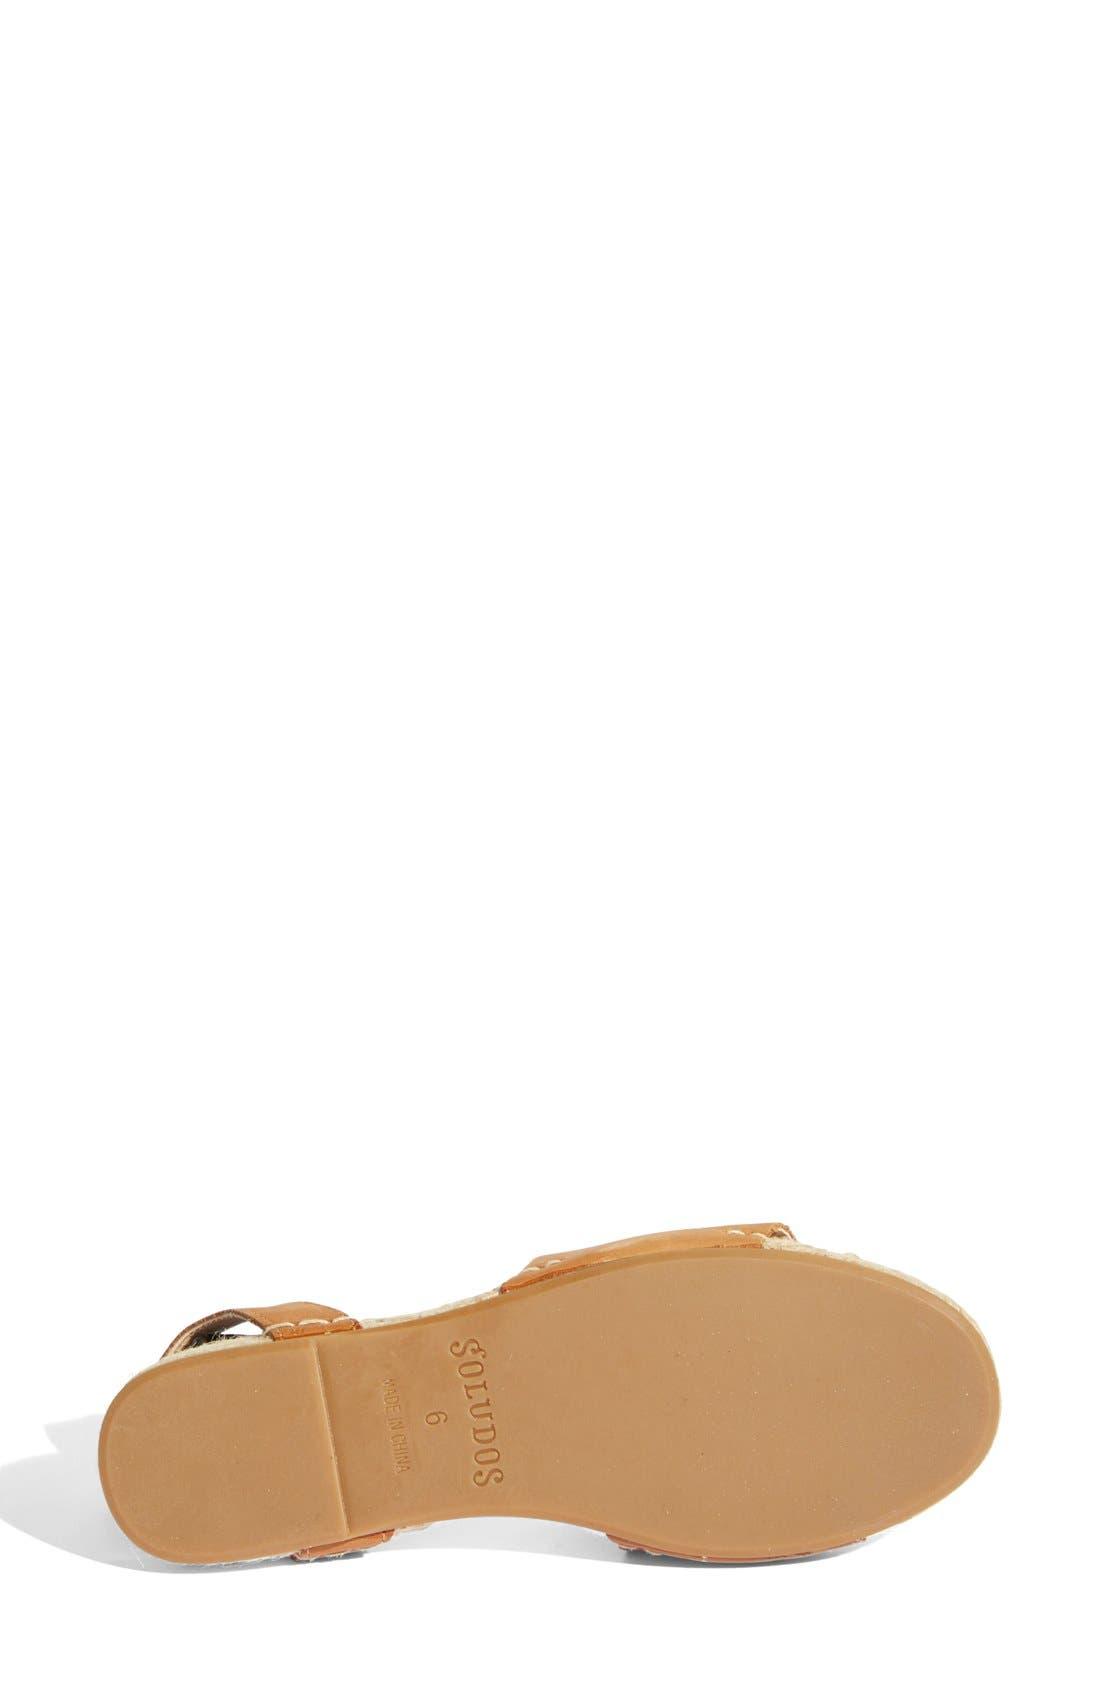 SOLUDOS, Slingback Sandal, Alternate thumbnail 3, color, 211